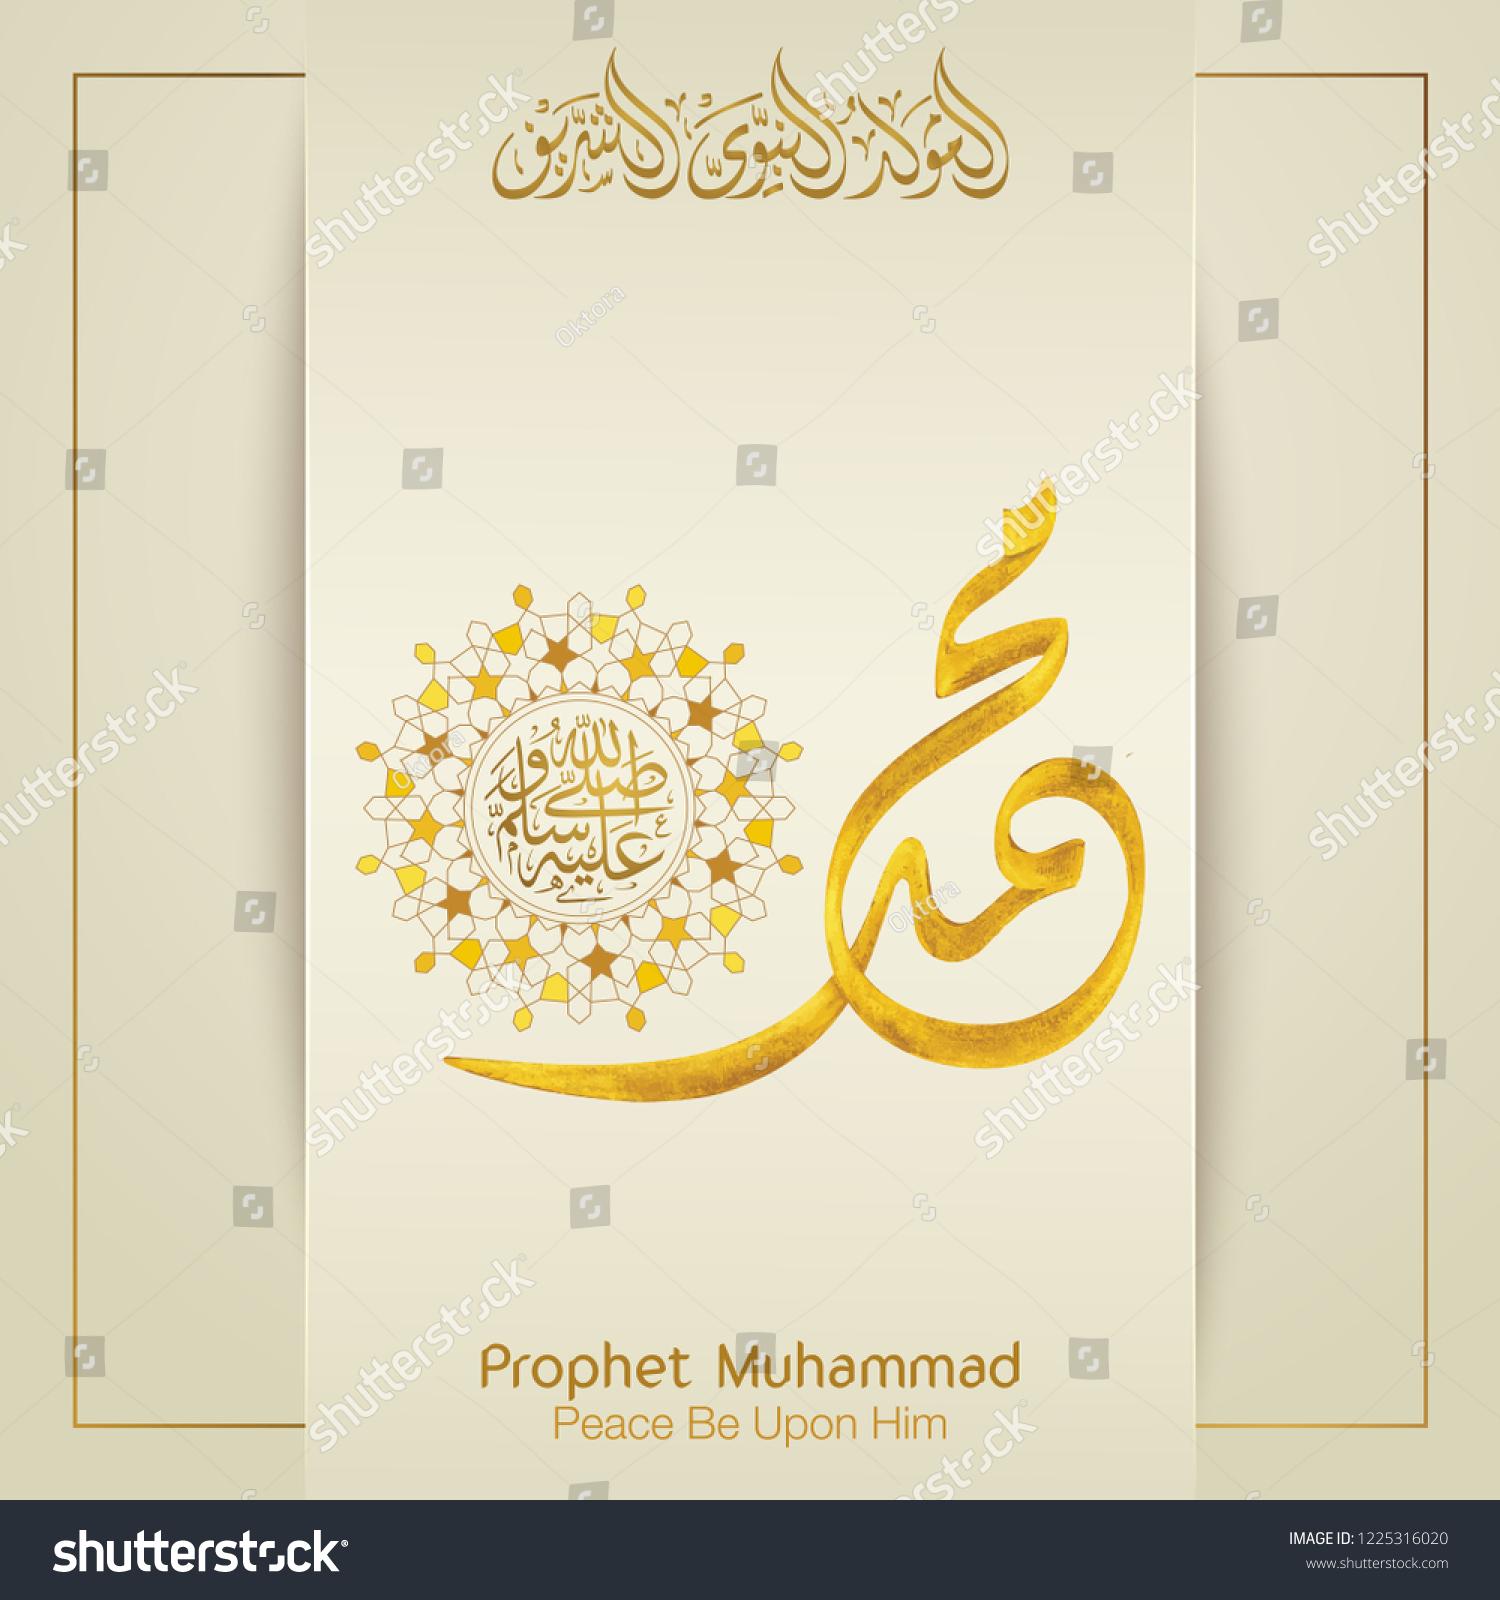 Mawlid Al Nabi Prophet Muhammads Birthday Greeting In Arabic Calligraphy With Geometric Pattern